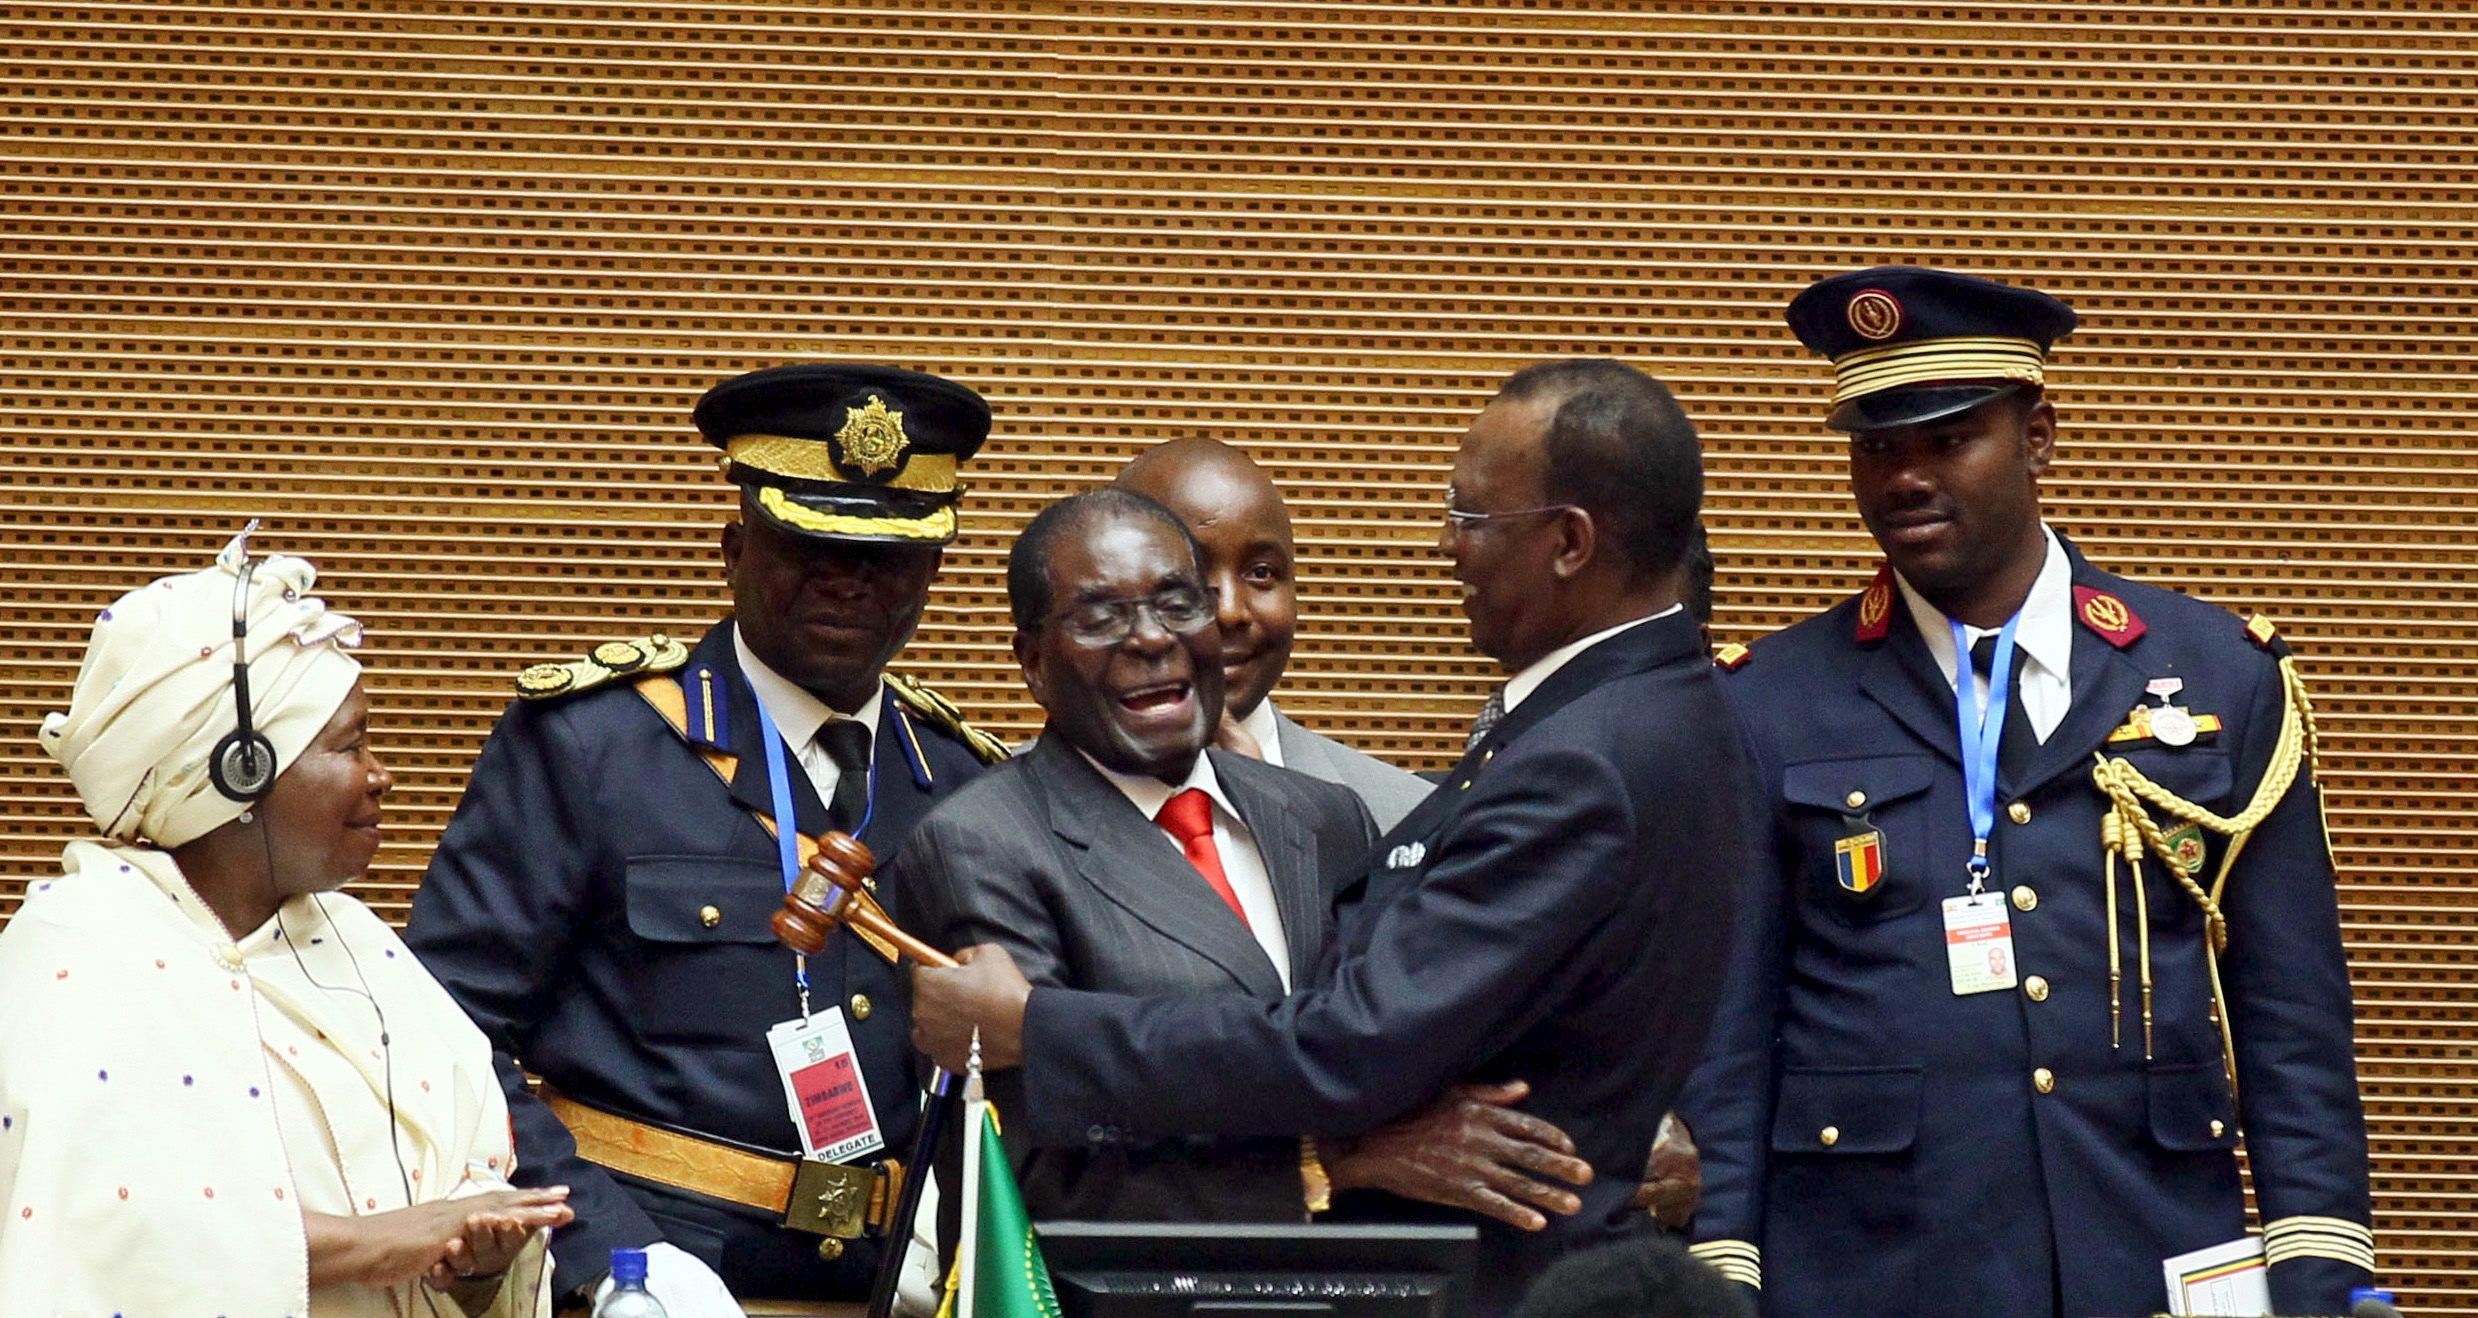 Nkosazana Dlamini-Zuma and Baleka Mbete emerge as possible candidates for South Africa's first woman president